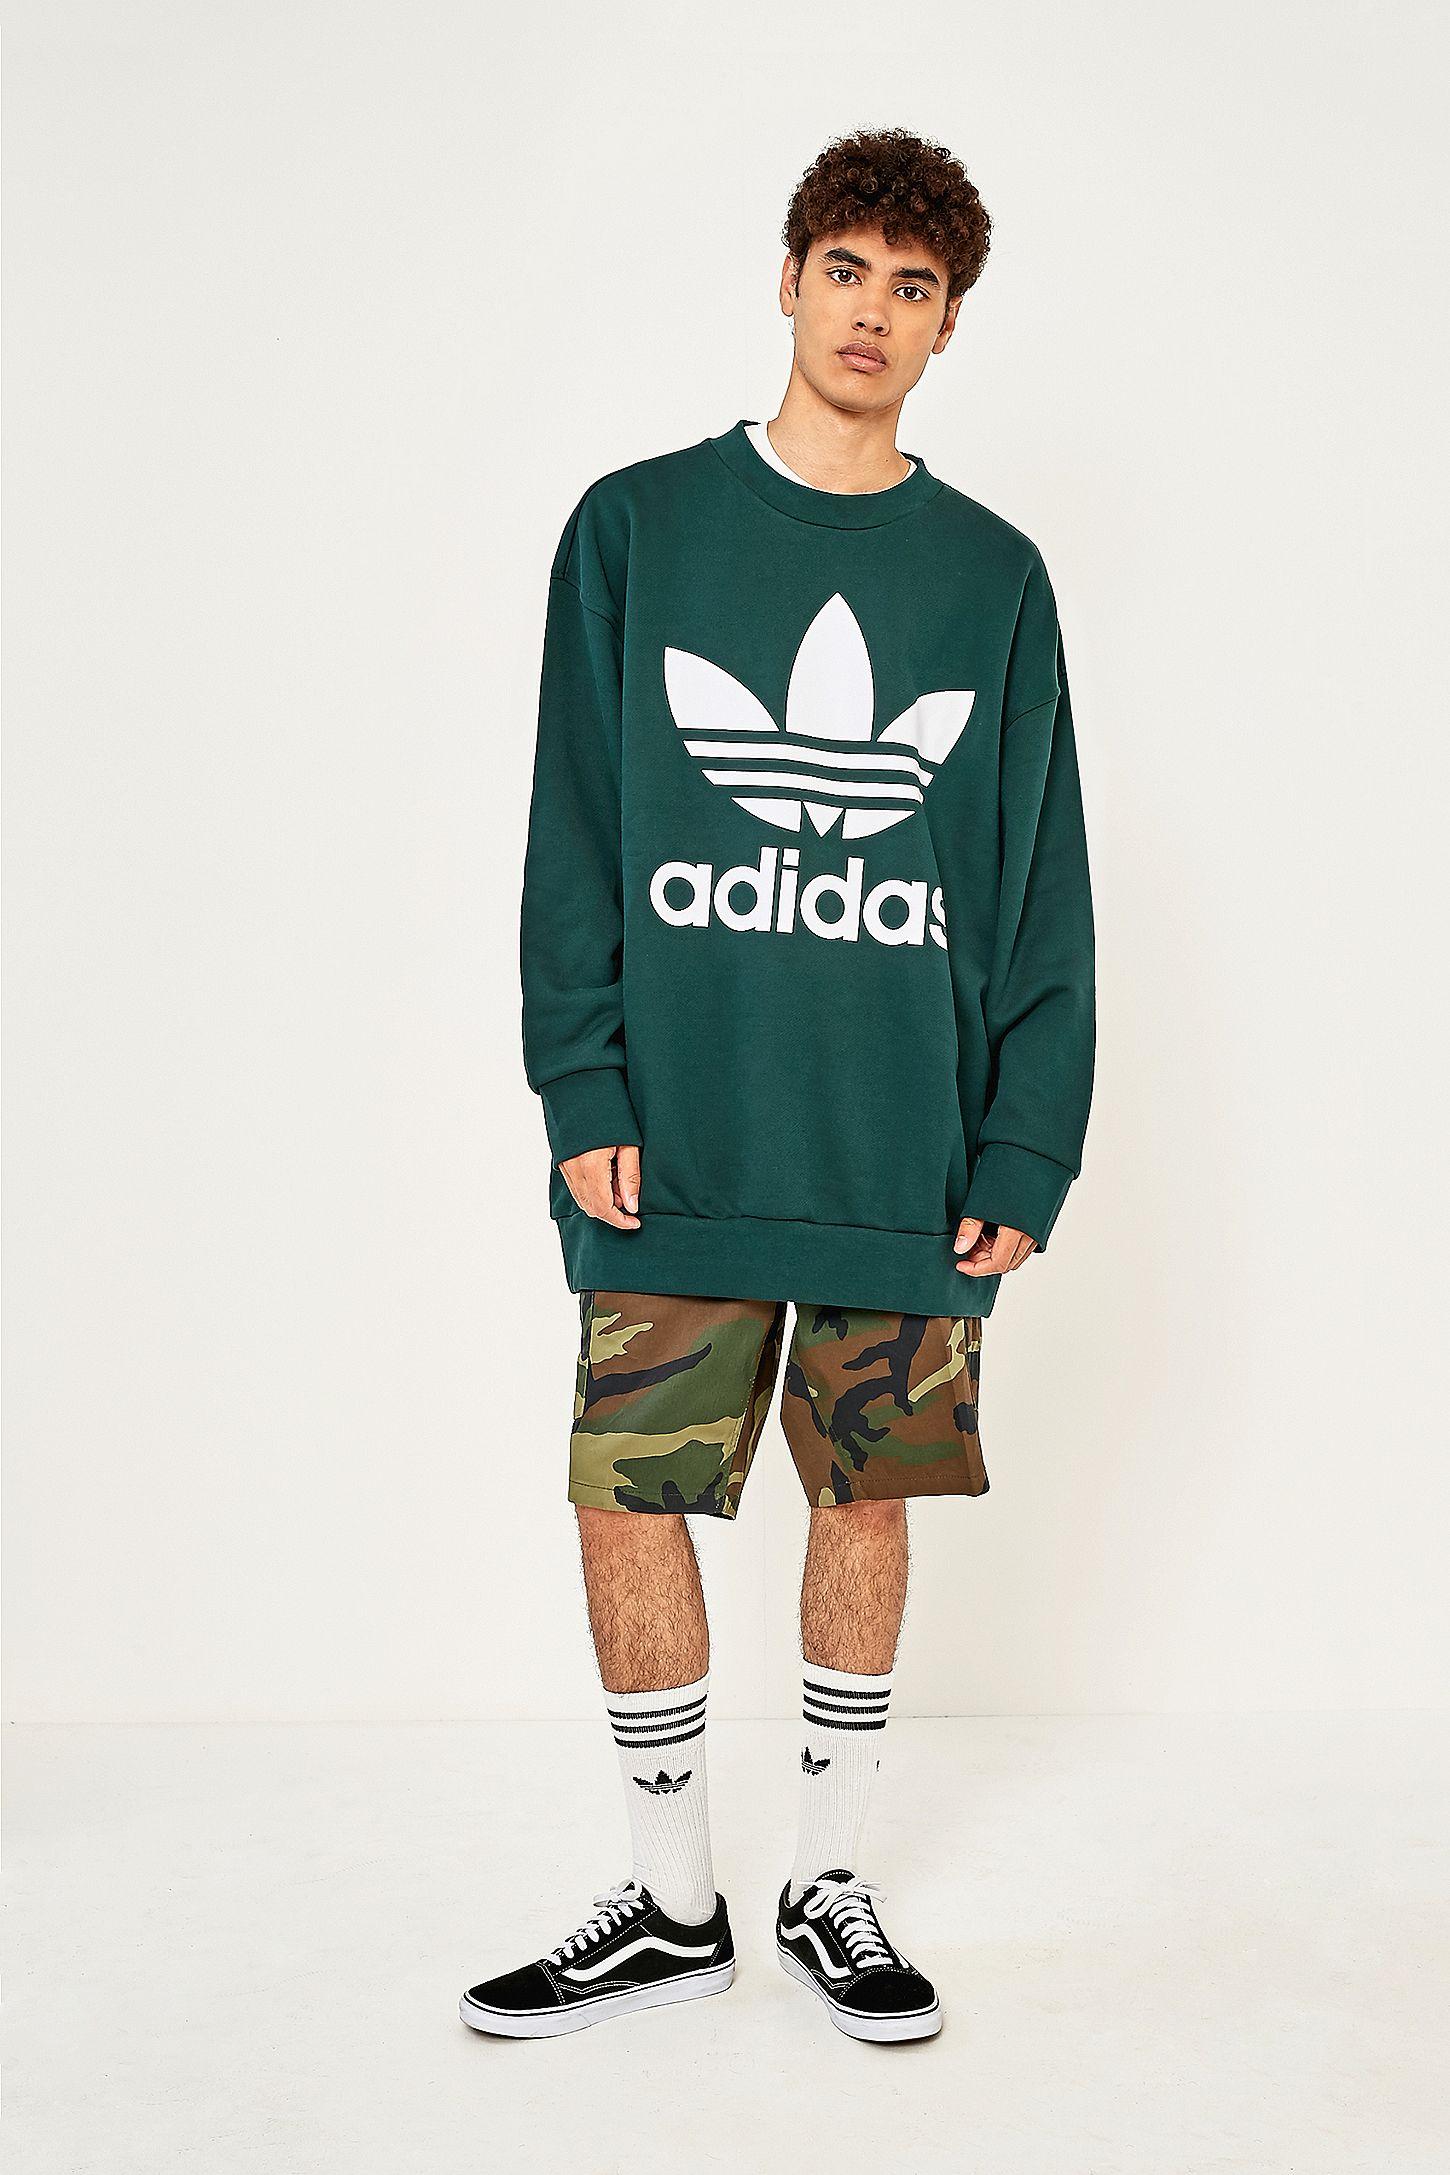 adidas Adicolor Oversized Green Night Crewneck Sweatshirt